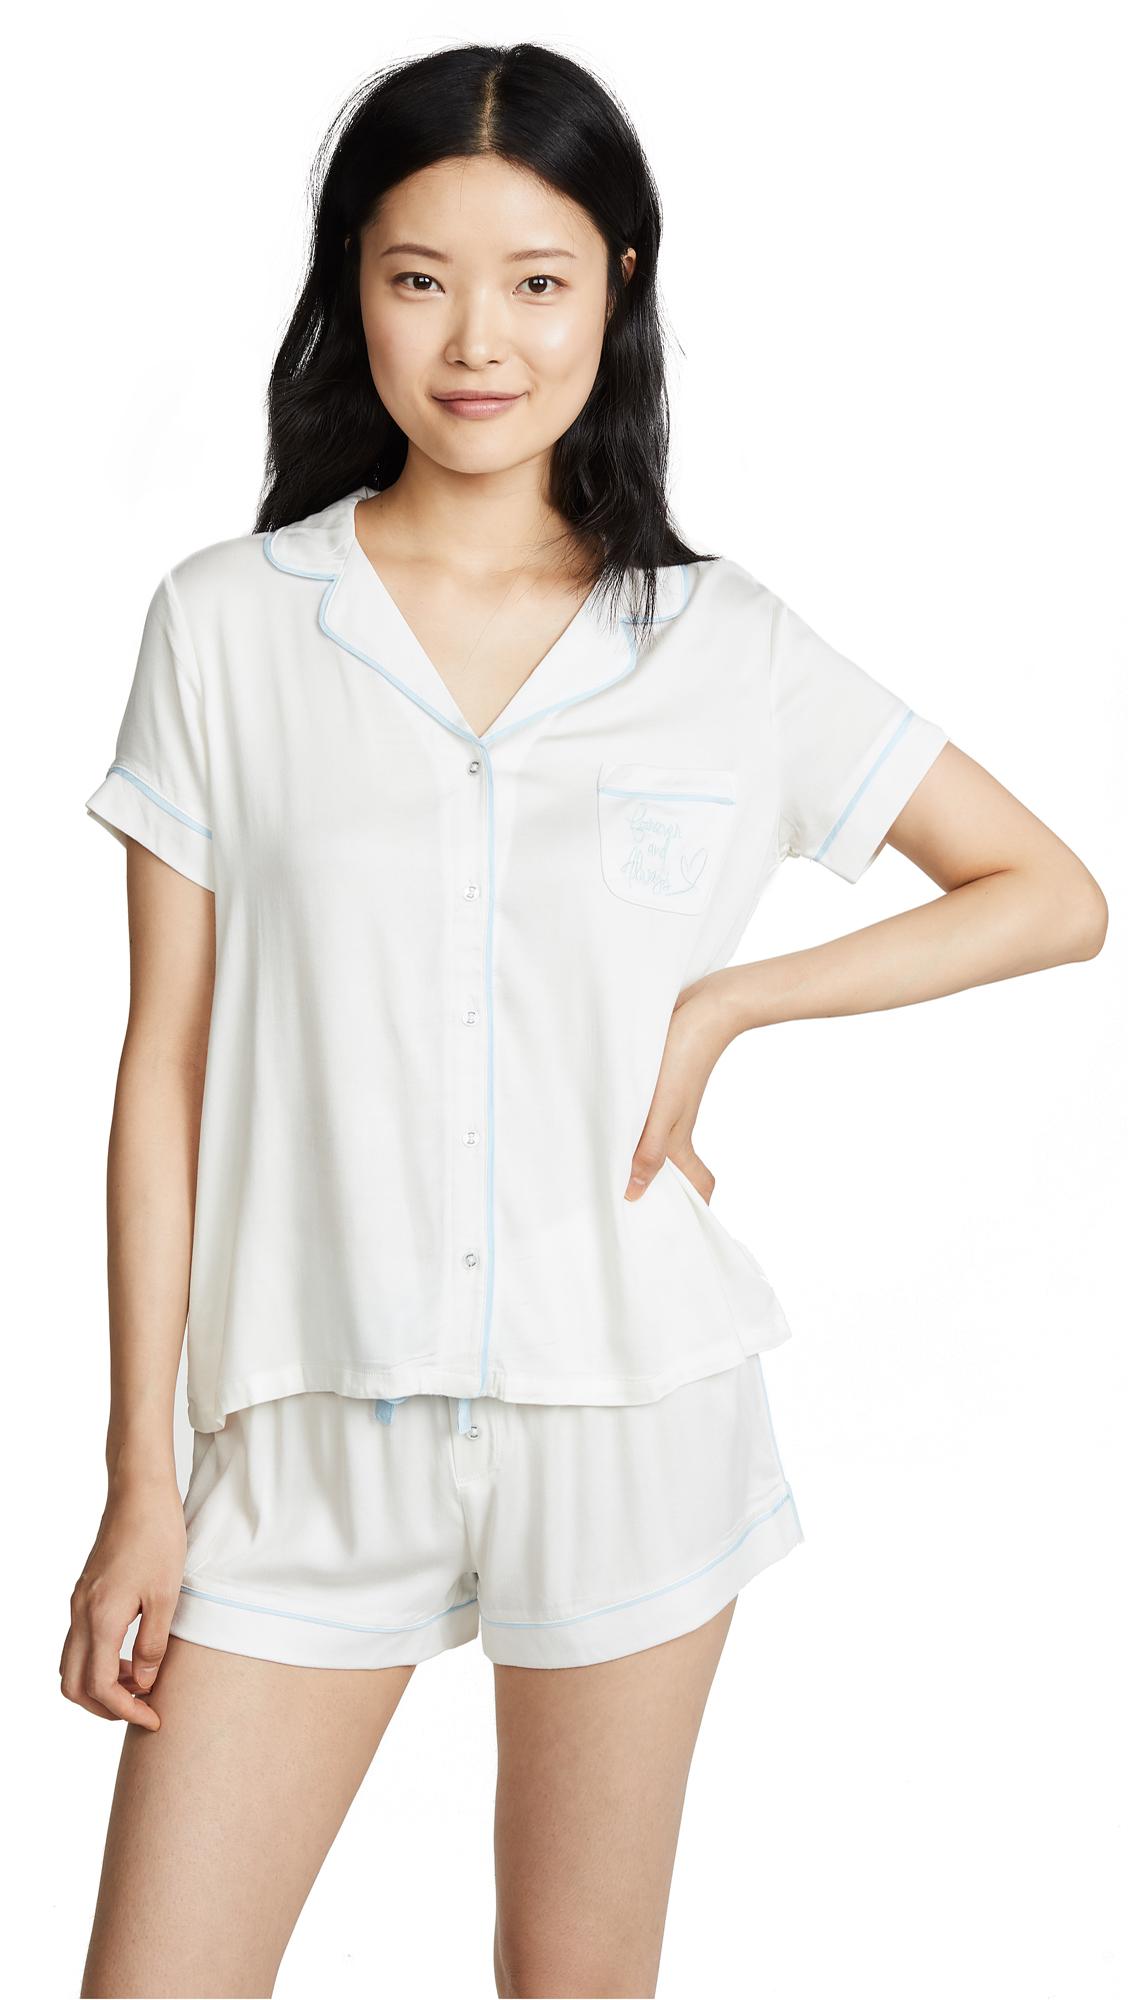 Splendid Bridal Shortie Pajama Set - Ivory